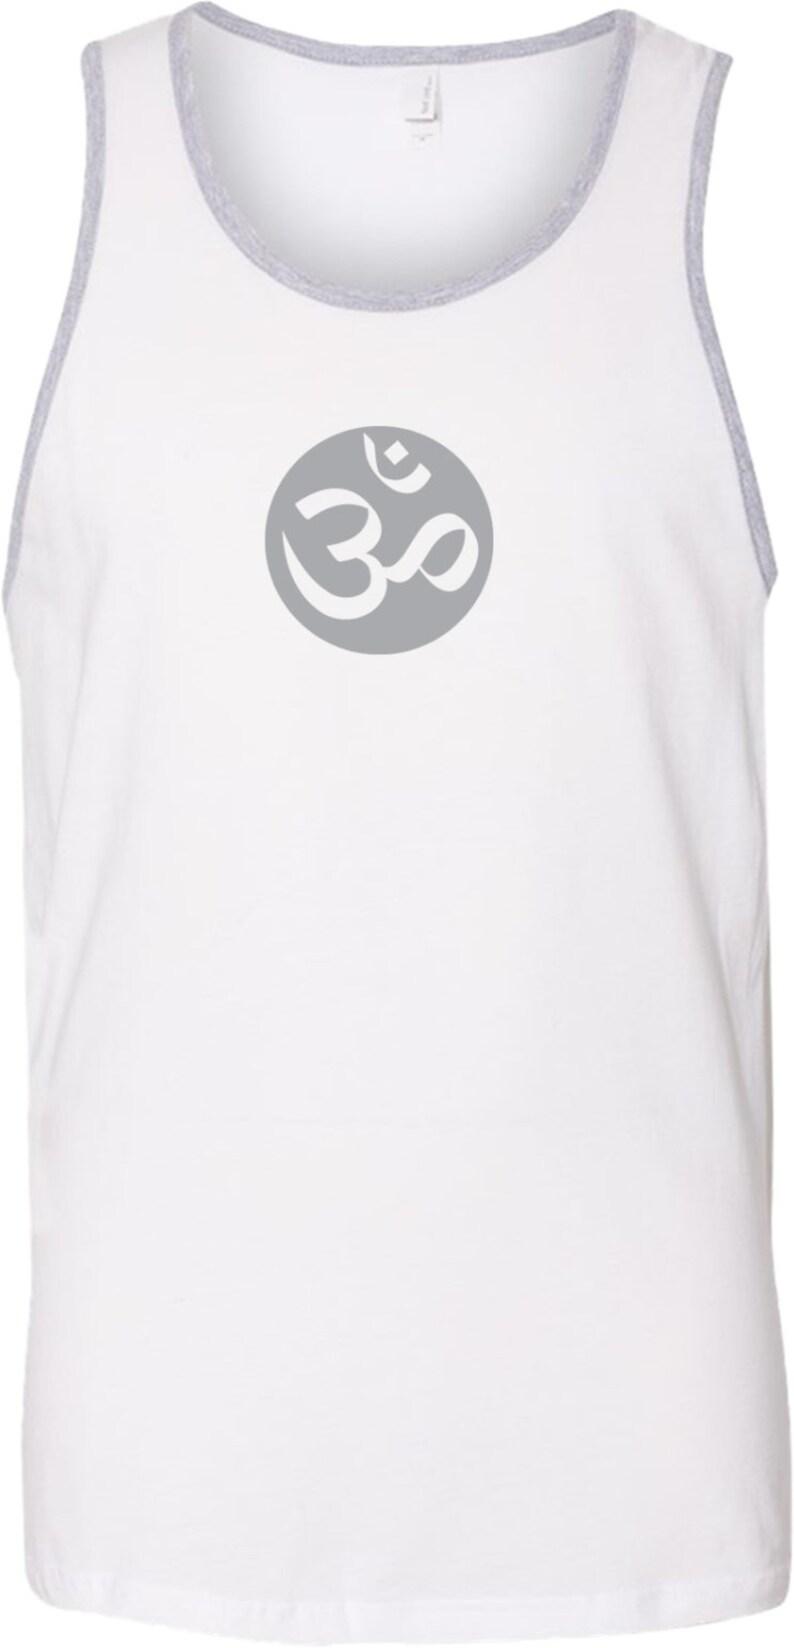 Big OM Print Men/'s Yoga Cotton Tank Top = BIGOM-3633